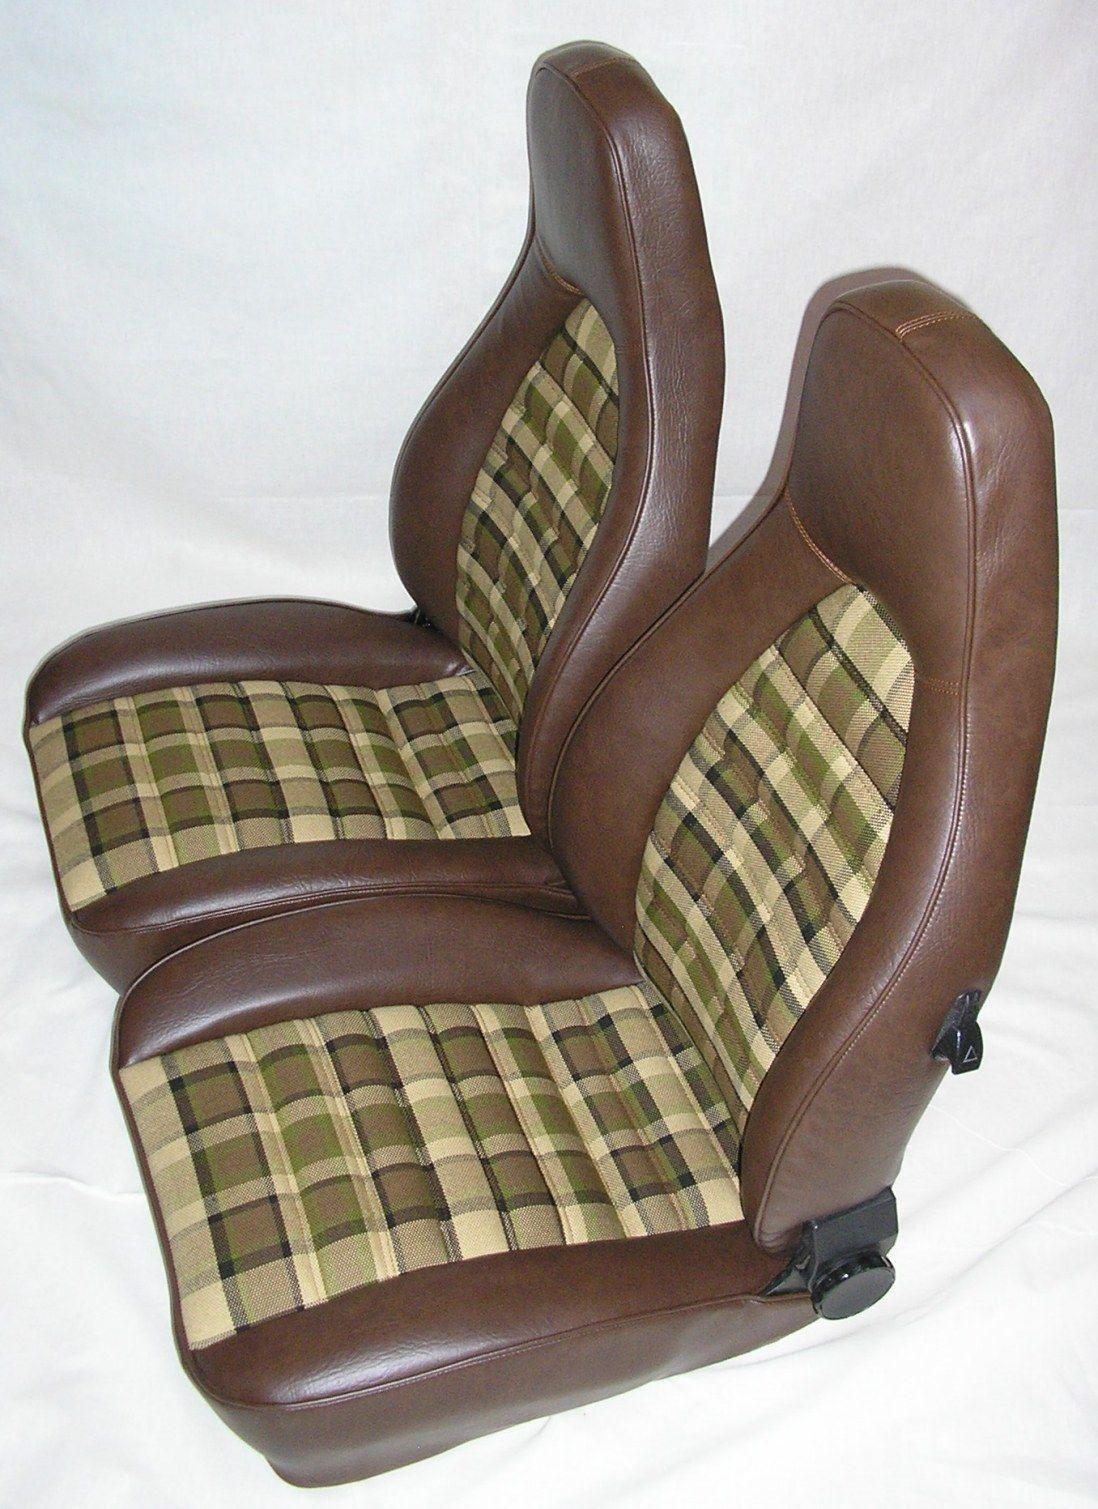 vw westfalia t1 t2 sitze braun kariert auch porsche 924. Black Bedroom Furniture Sets. Home Design Ideas